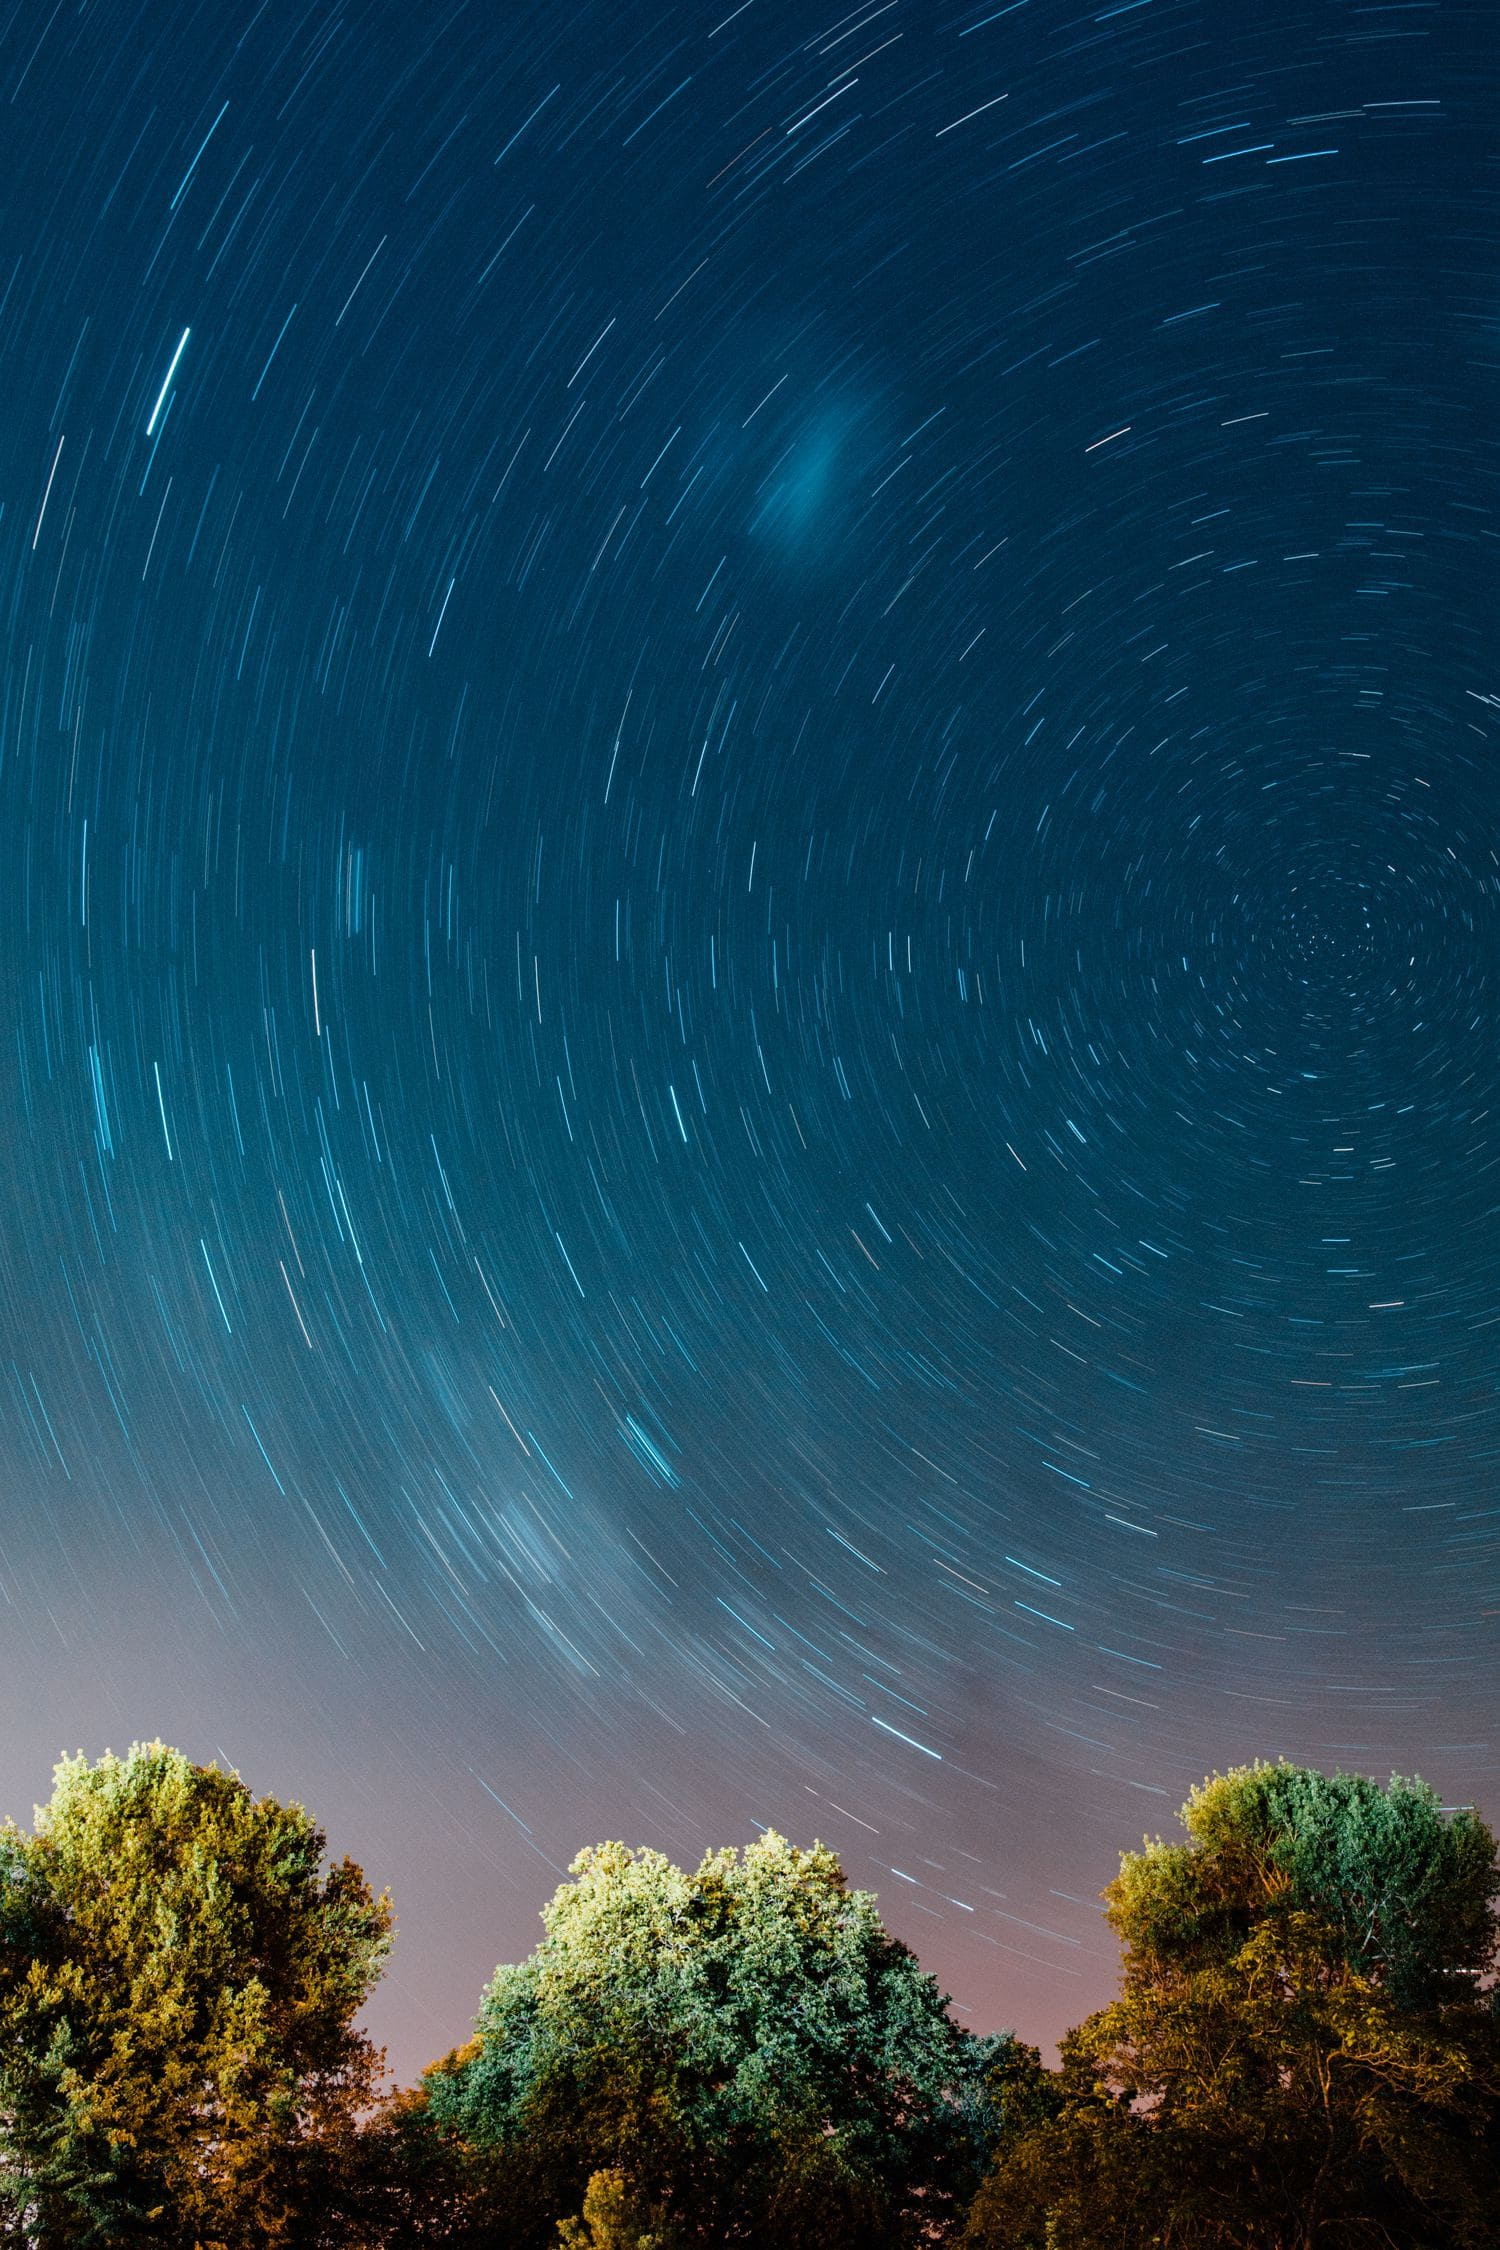 estrellas larga exposición